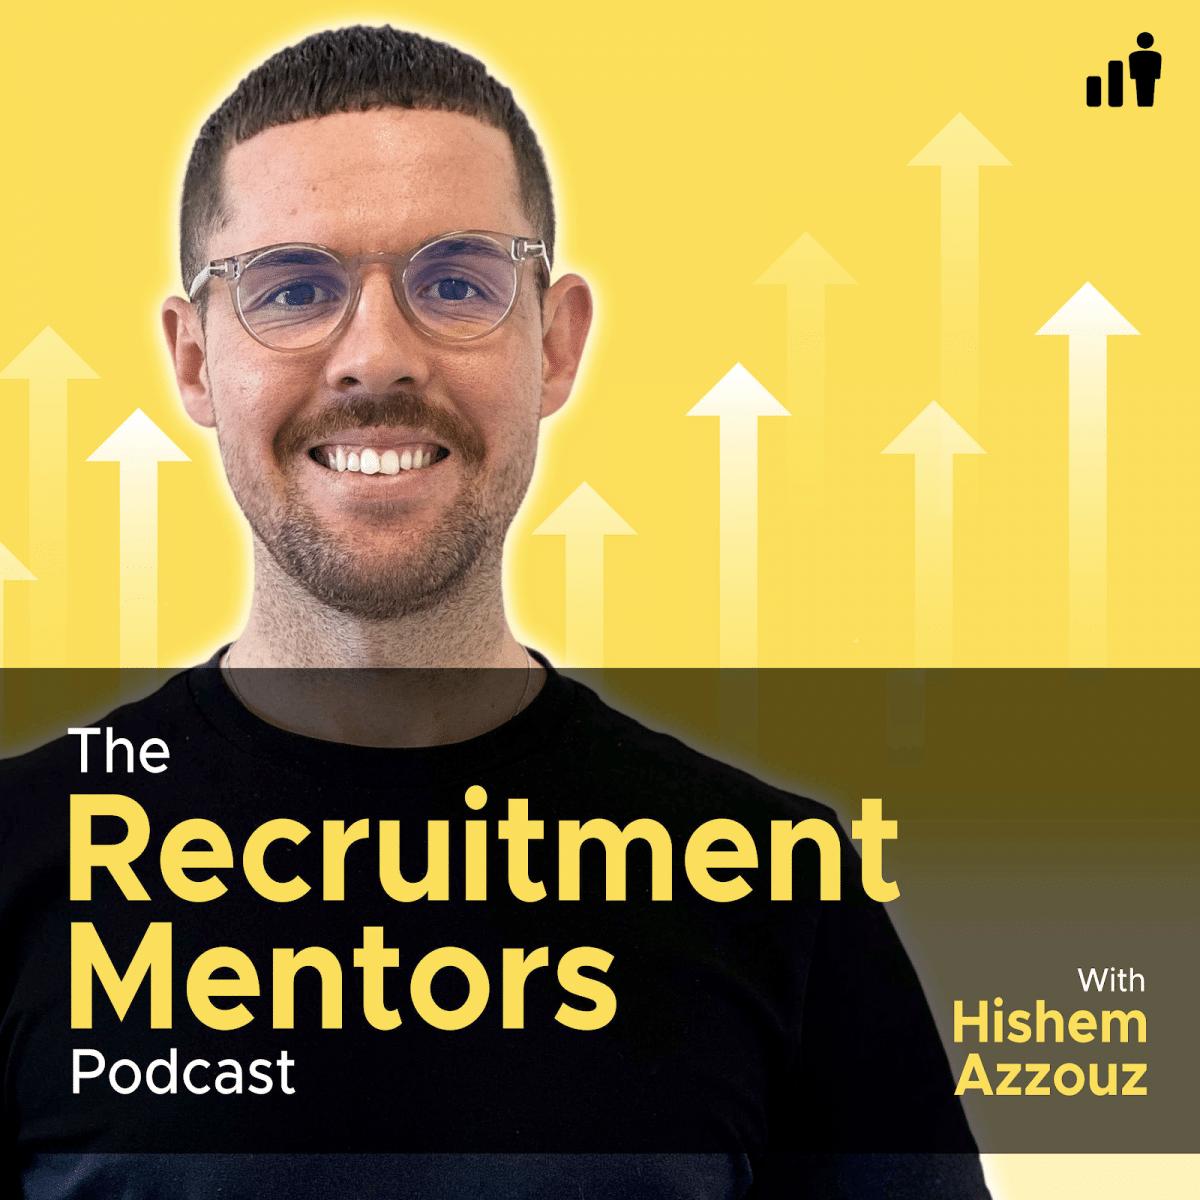 Hishem Azzouz from The Recruitment Mentors Podcast